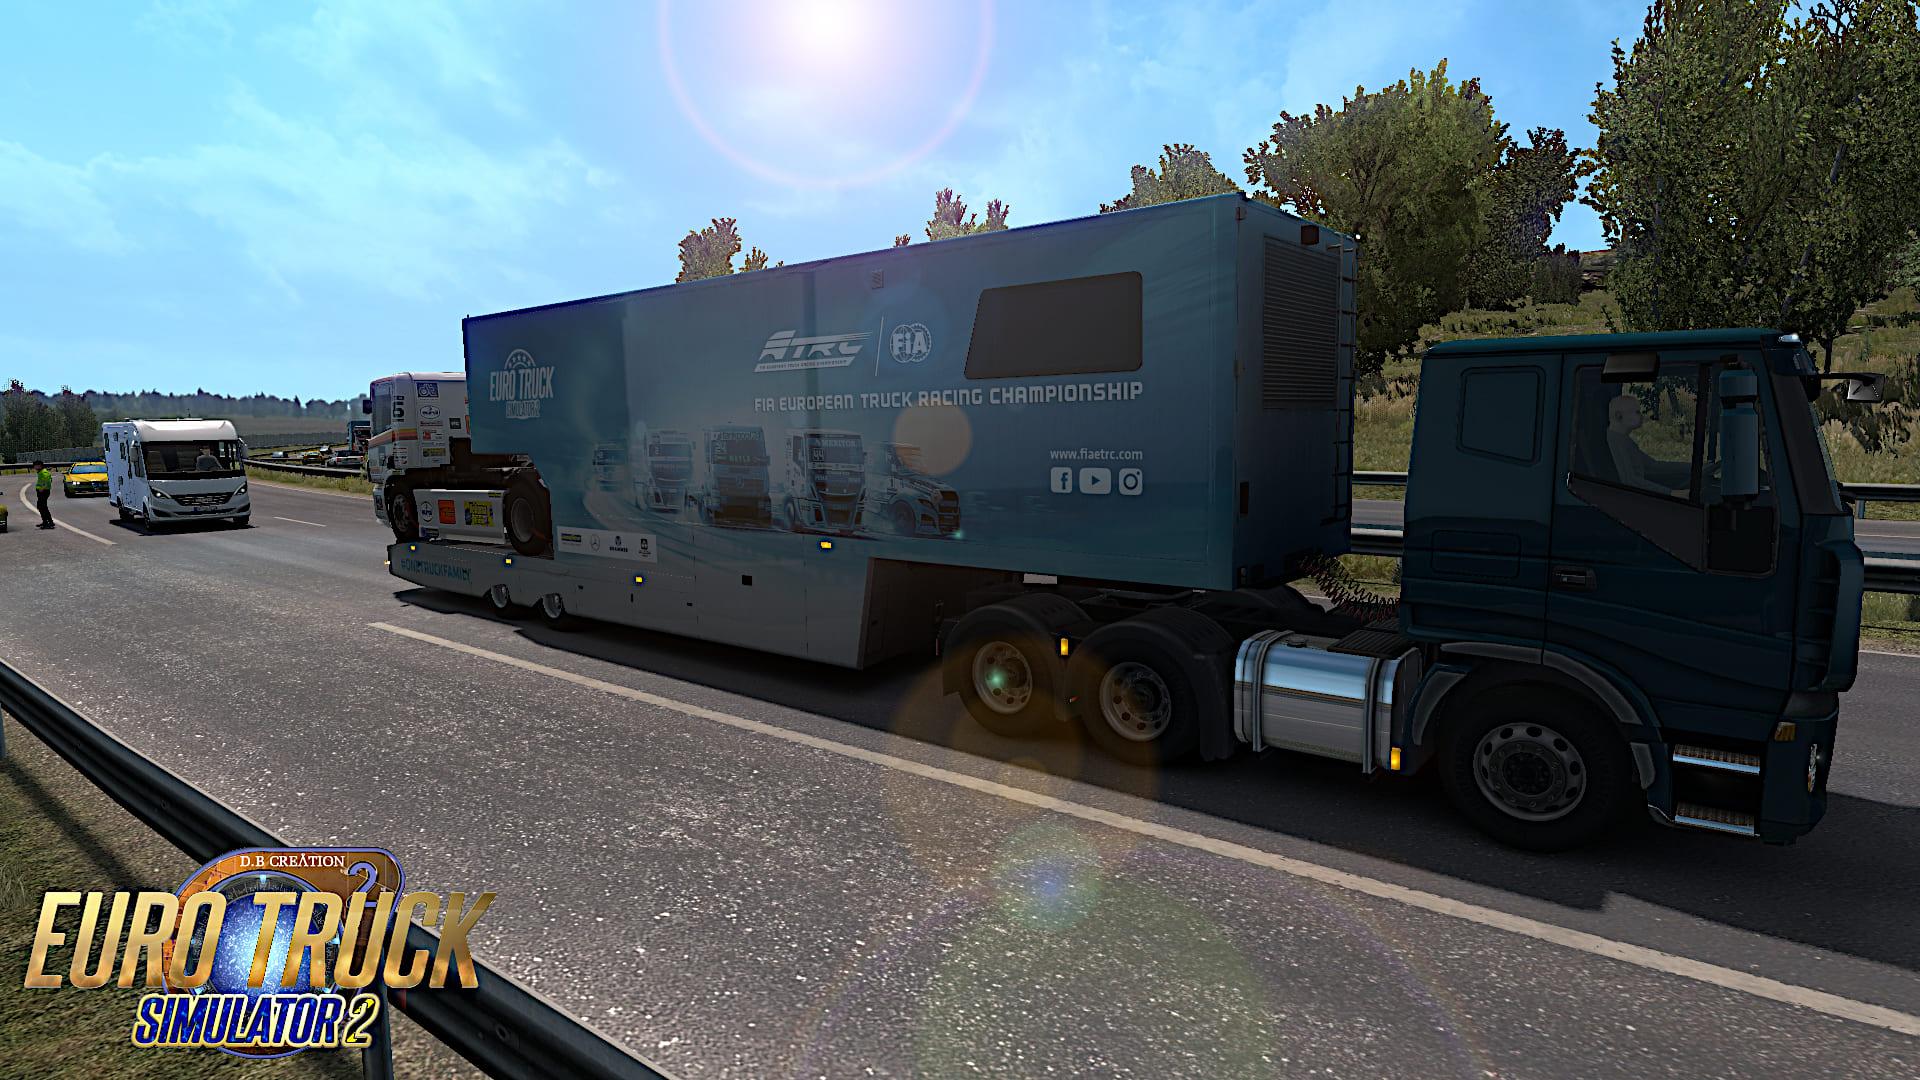 D B Creation | Euro Truck Simulator 2 | 1 35 | AI Mods